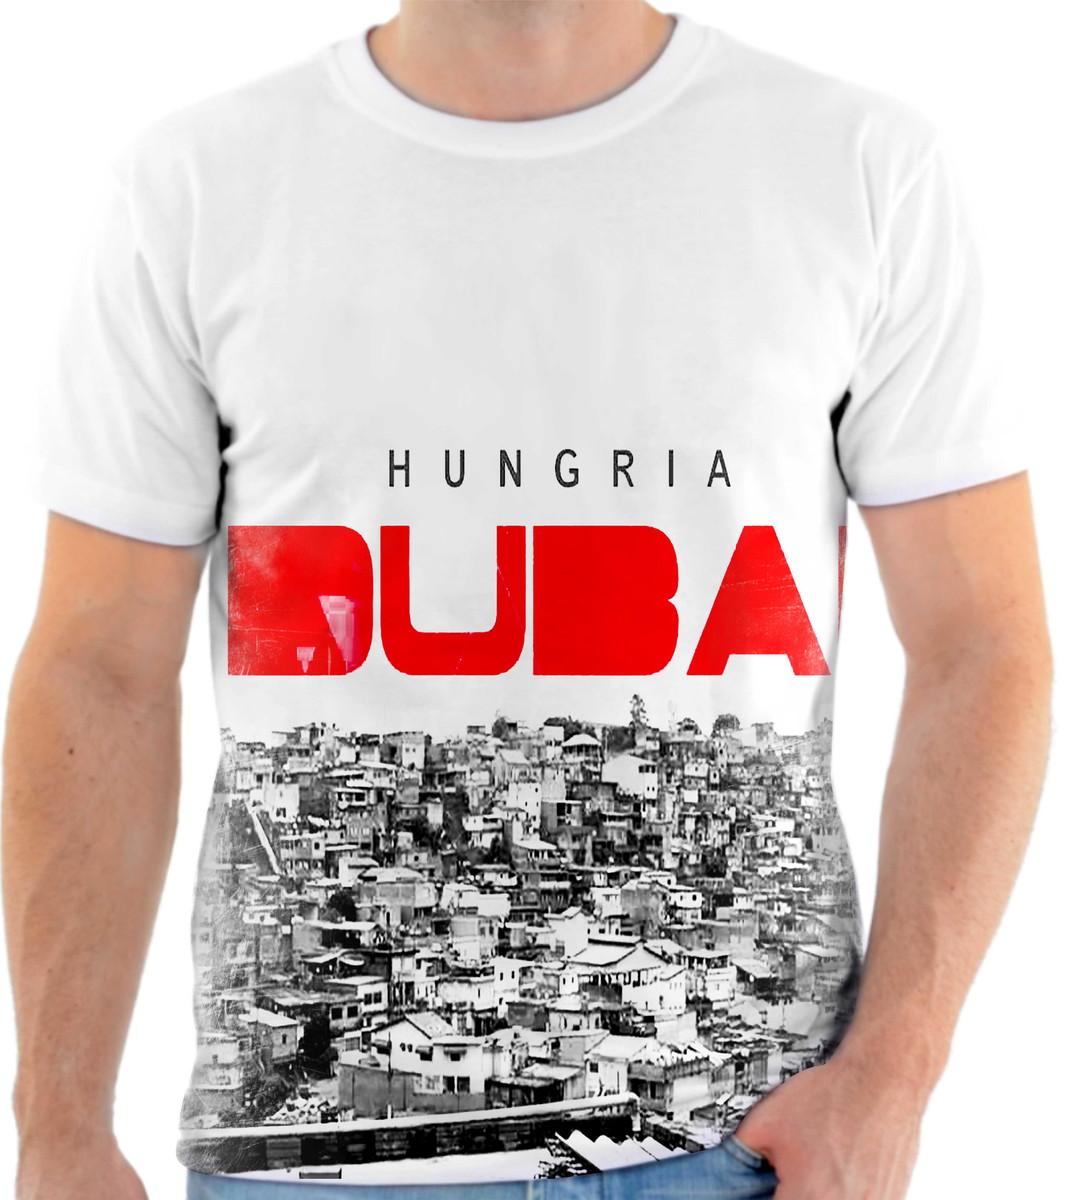 553703c8dfc2c Camisa Camiseta Personaliza Cantor Hungria Hip Hop Rap 5 no Elo7 ...